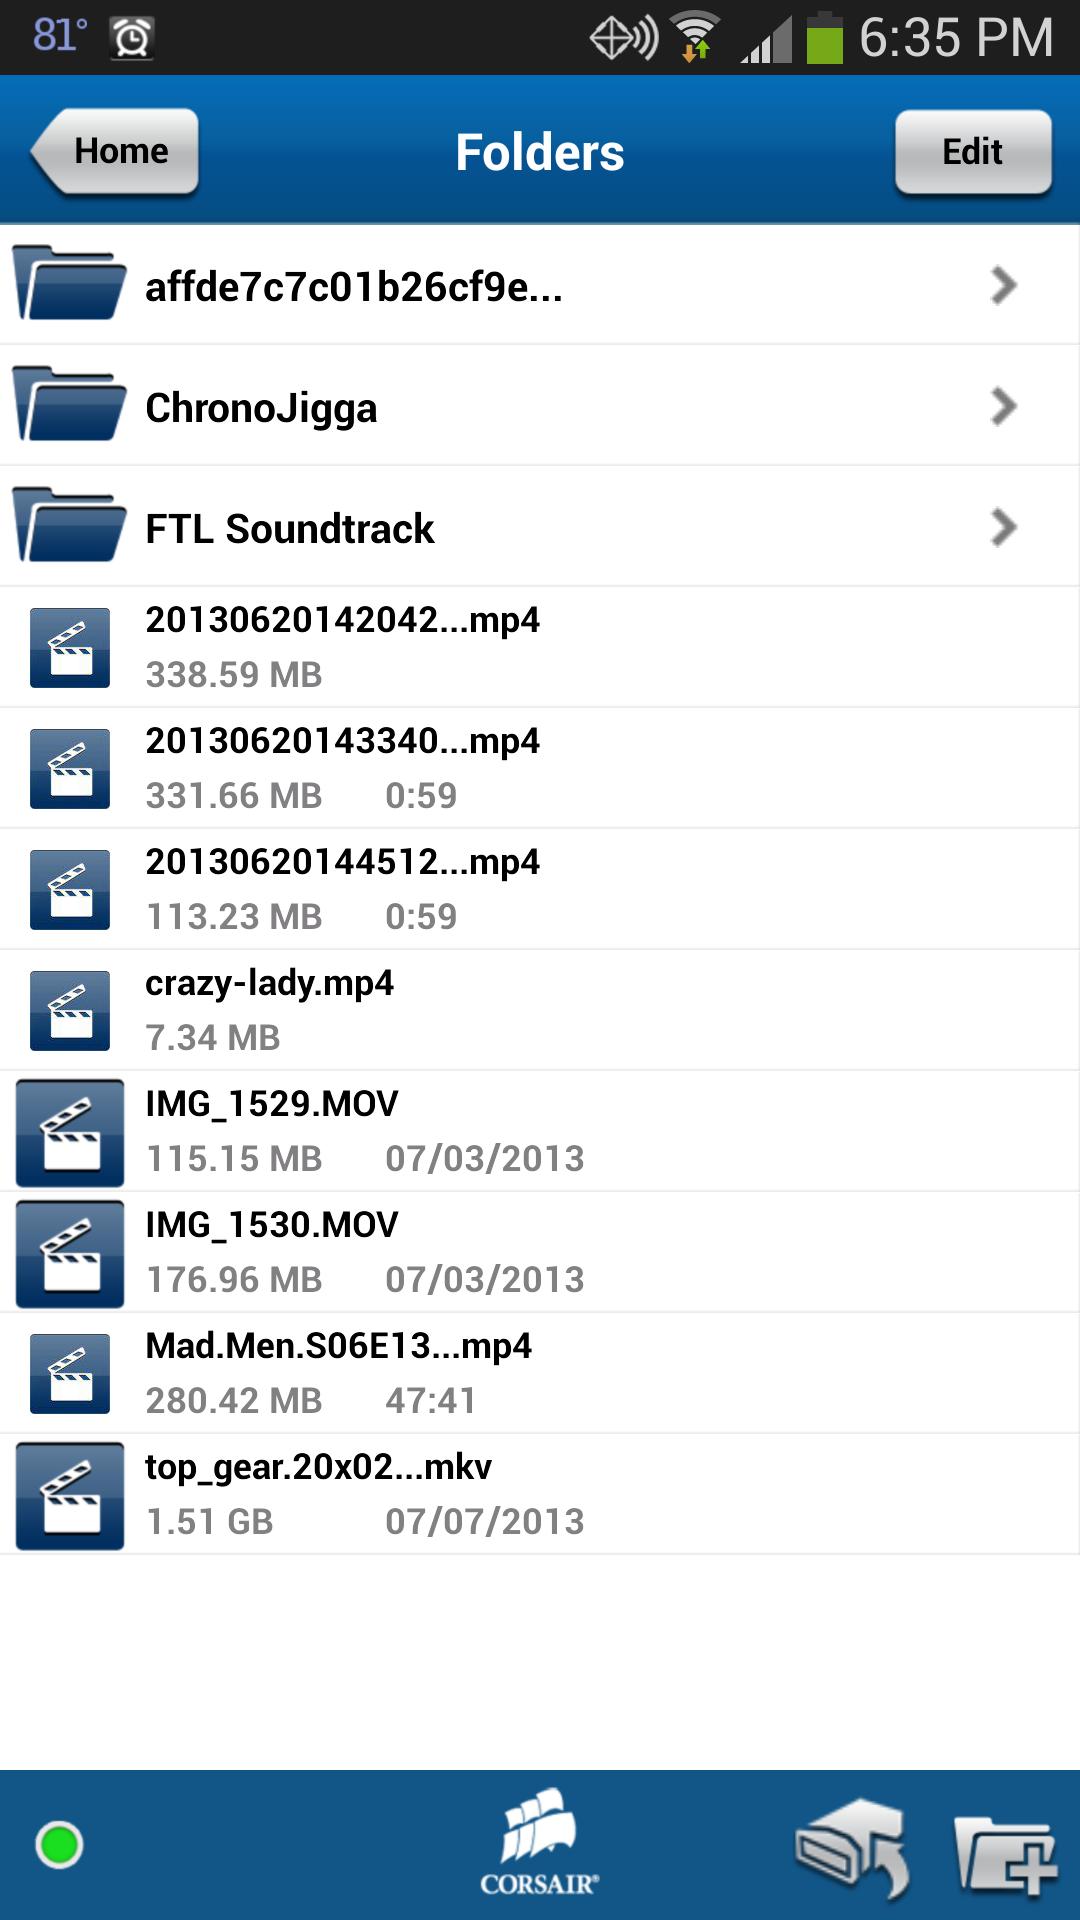 screenshot-2013-08-08-18-35-34-0.png